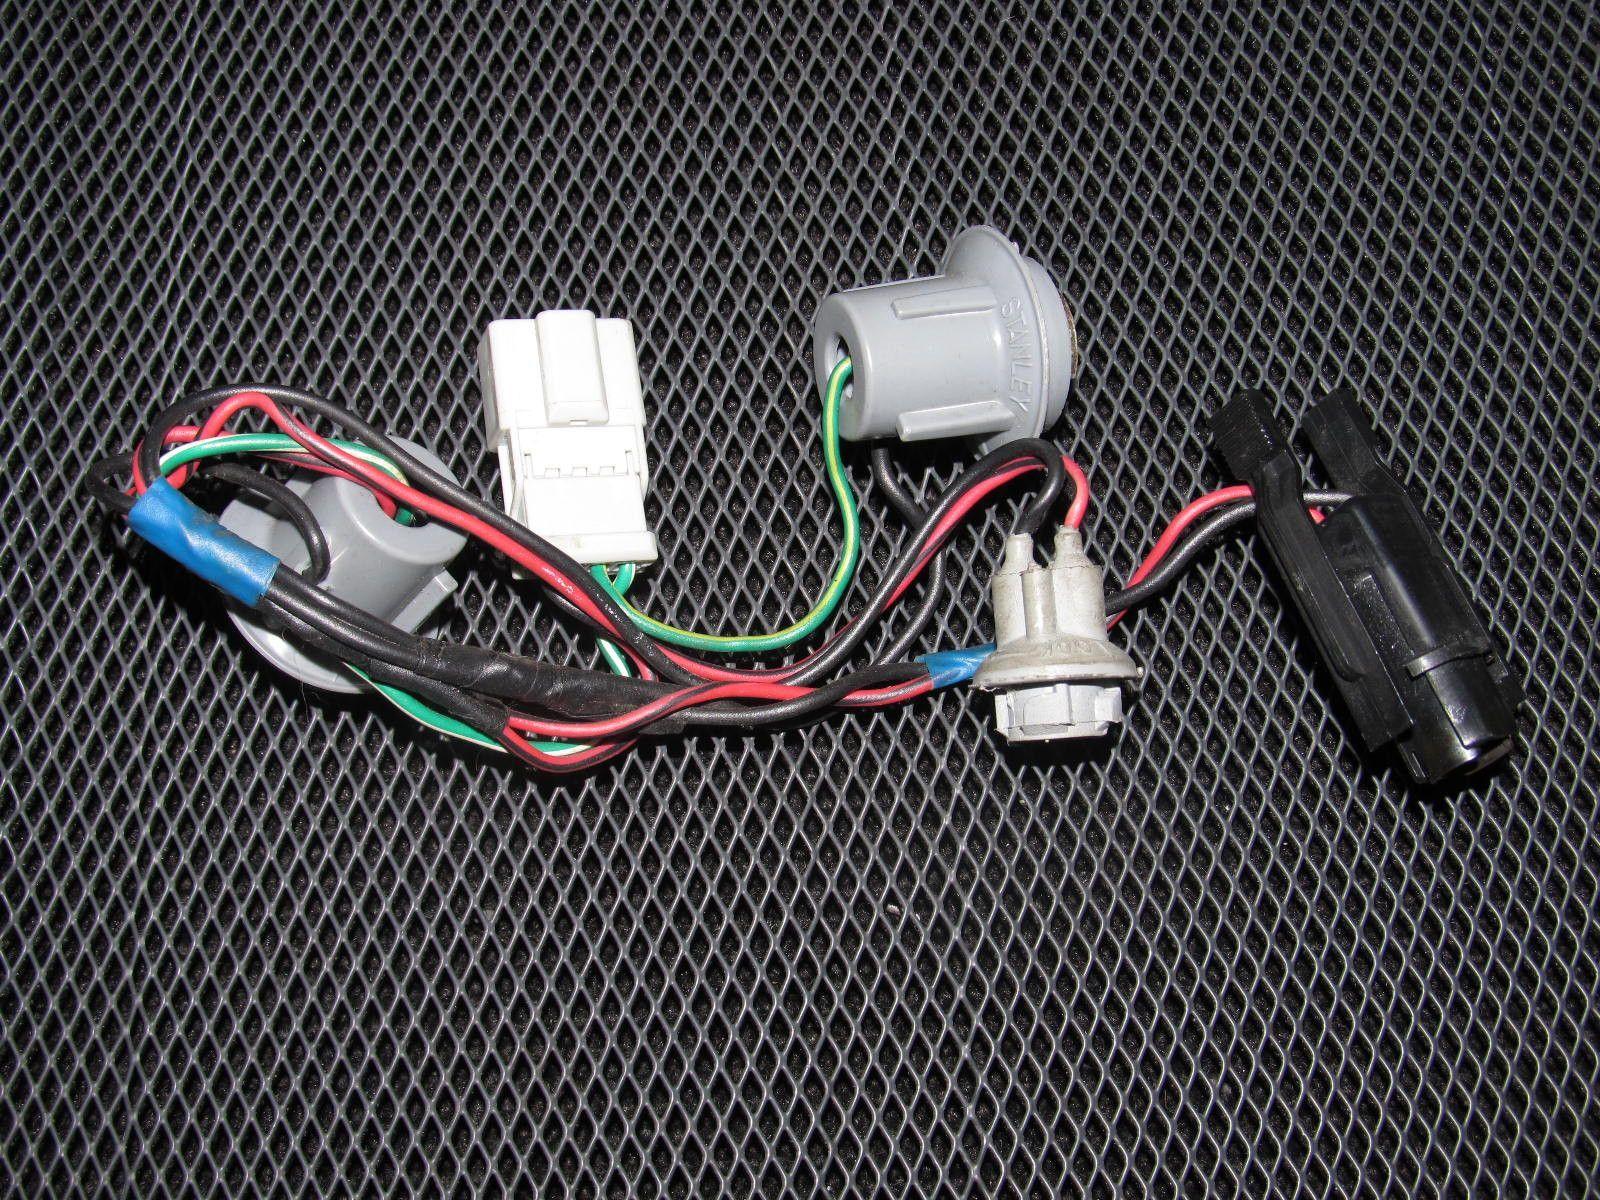 88 91 honda crx oem tail light bulb socket harness [ 1600 x 1200 Pixel ]